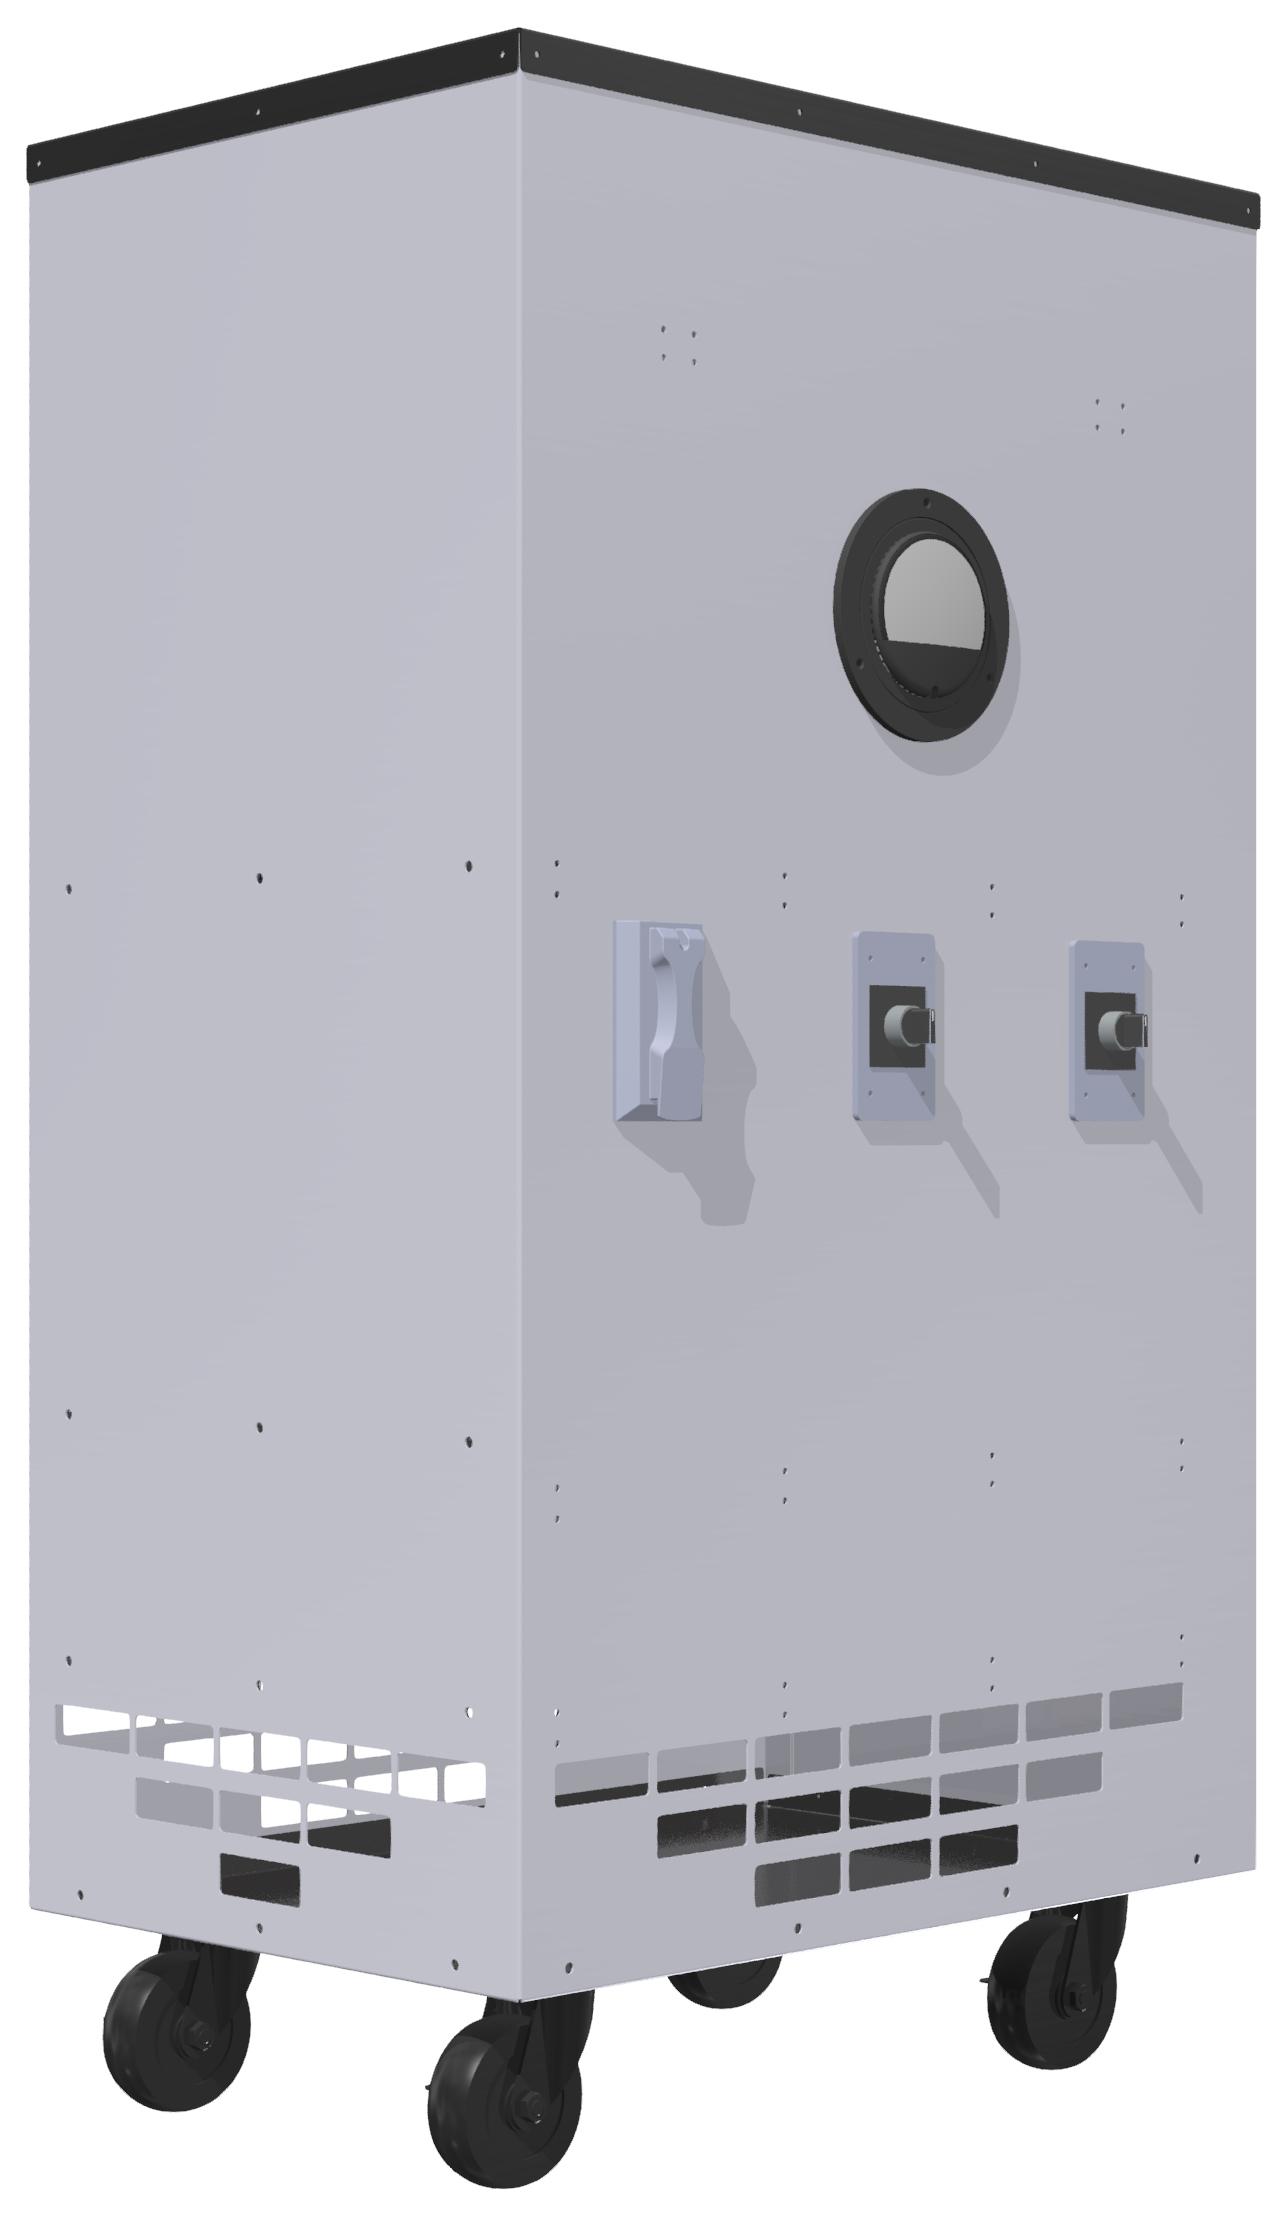 Portable Air Purifier 1000 - Portable air purifier 1000 2